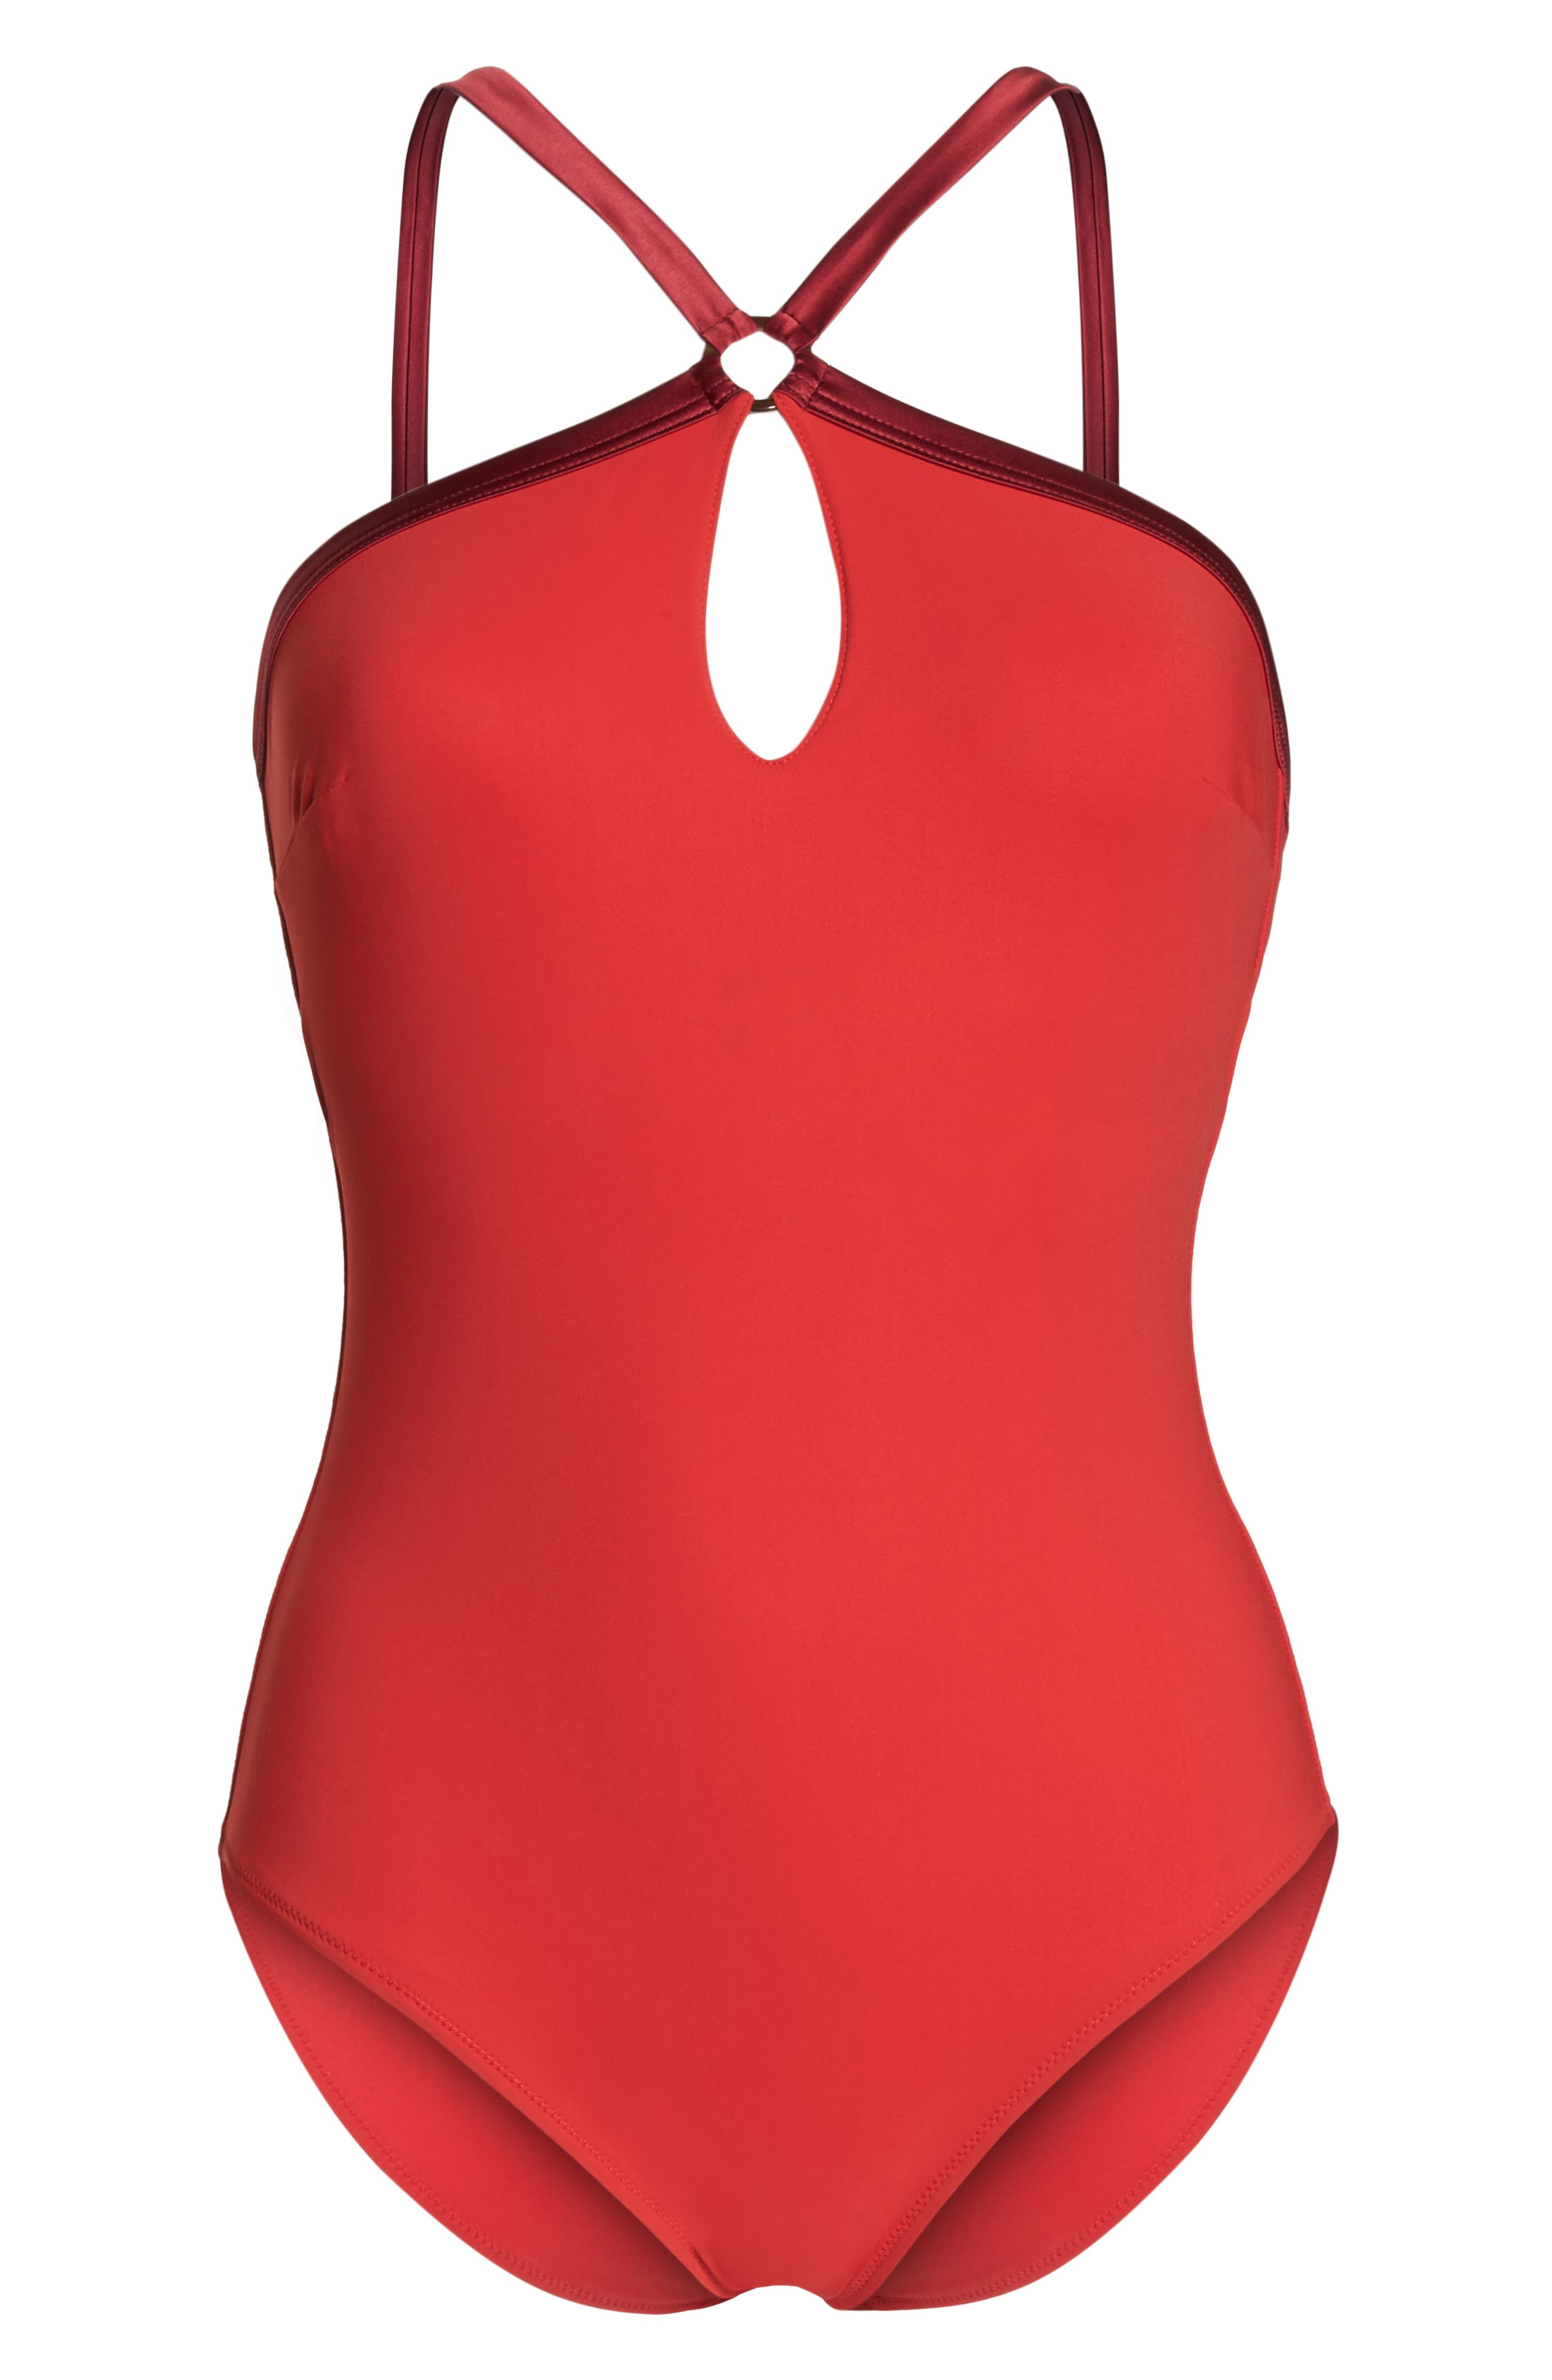 VILEBREQUIN, Tuxedo One-Piece Swimsuit, Alternate thumbnail 7, color, ROUGE LAQUE